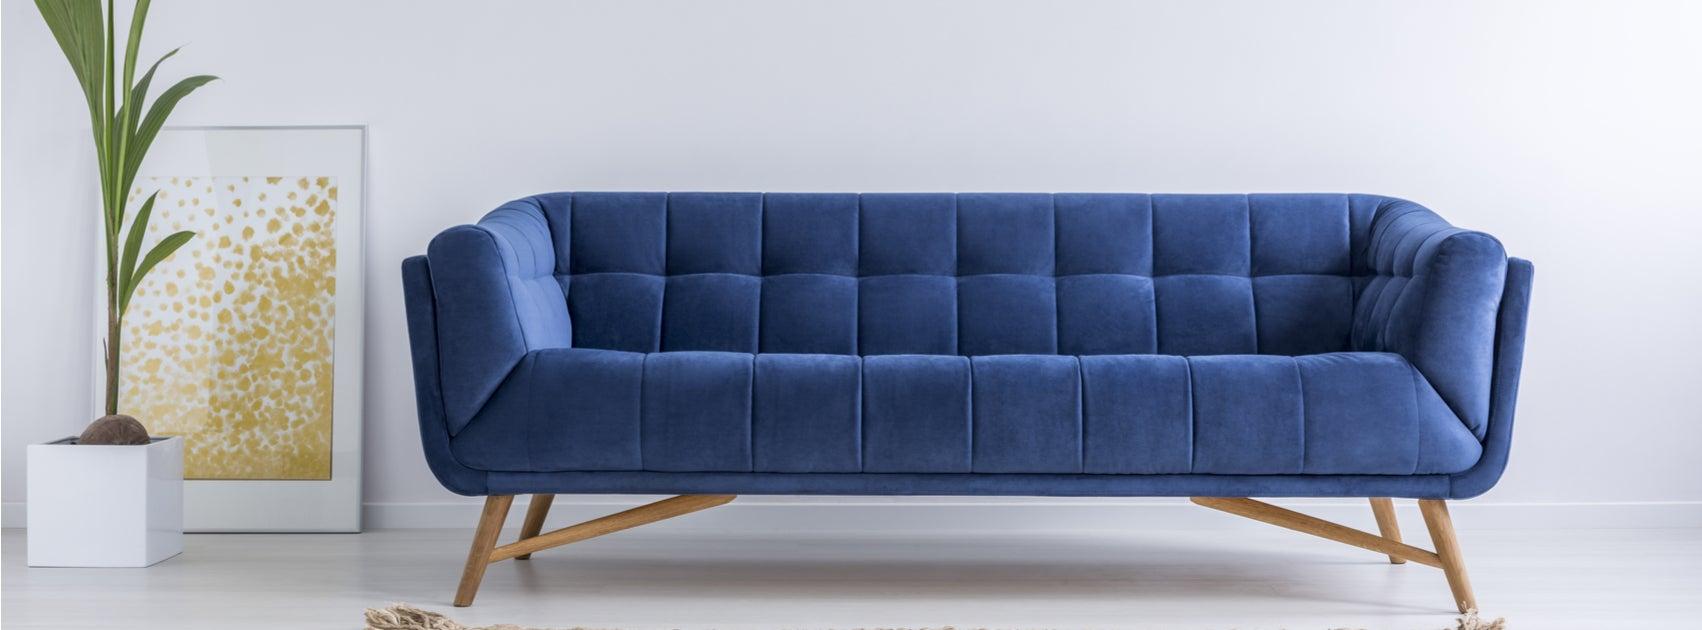 Choosing a Sofa: 5 Tips For Choosing The Right Sofa